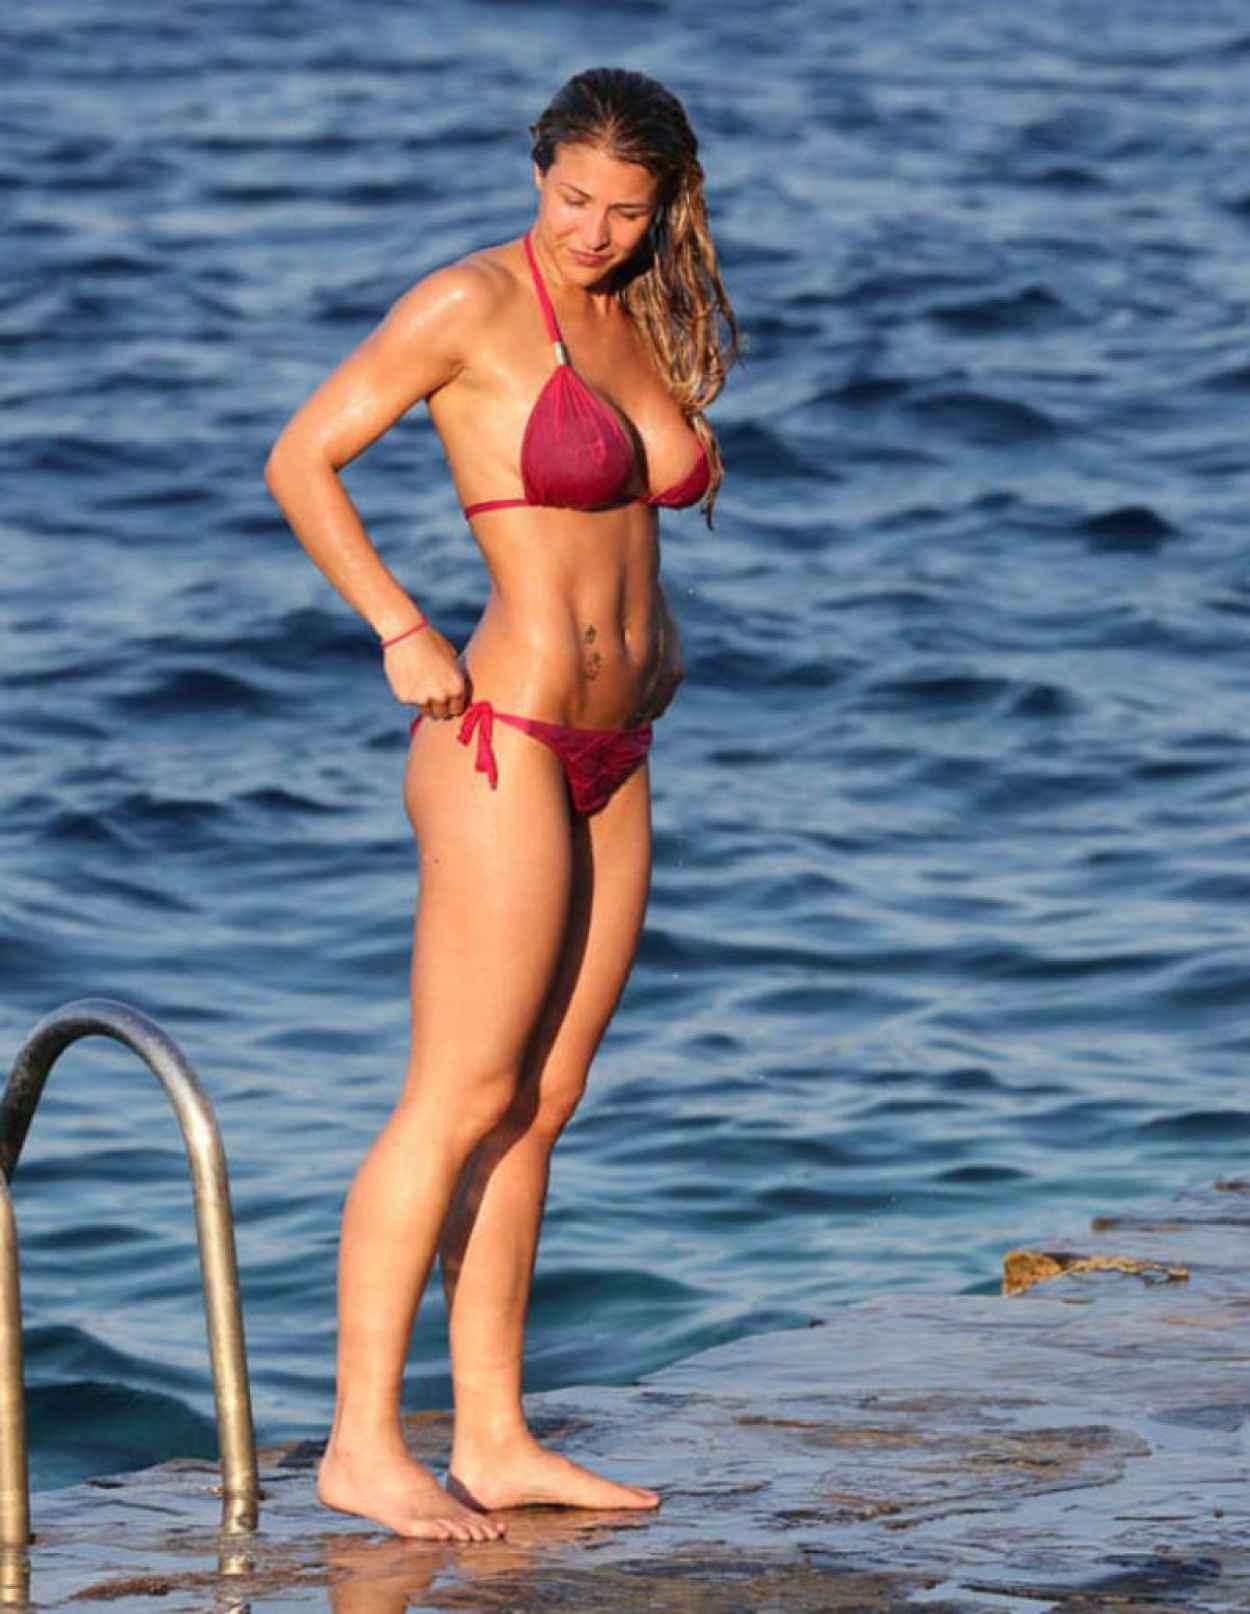 Gemma Atkinson in Pink Bikini - March 2015-5